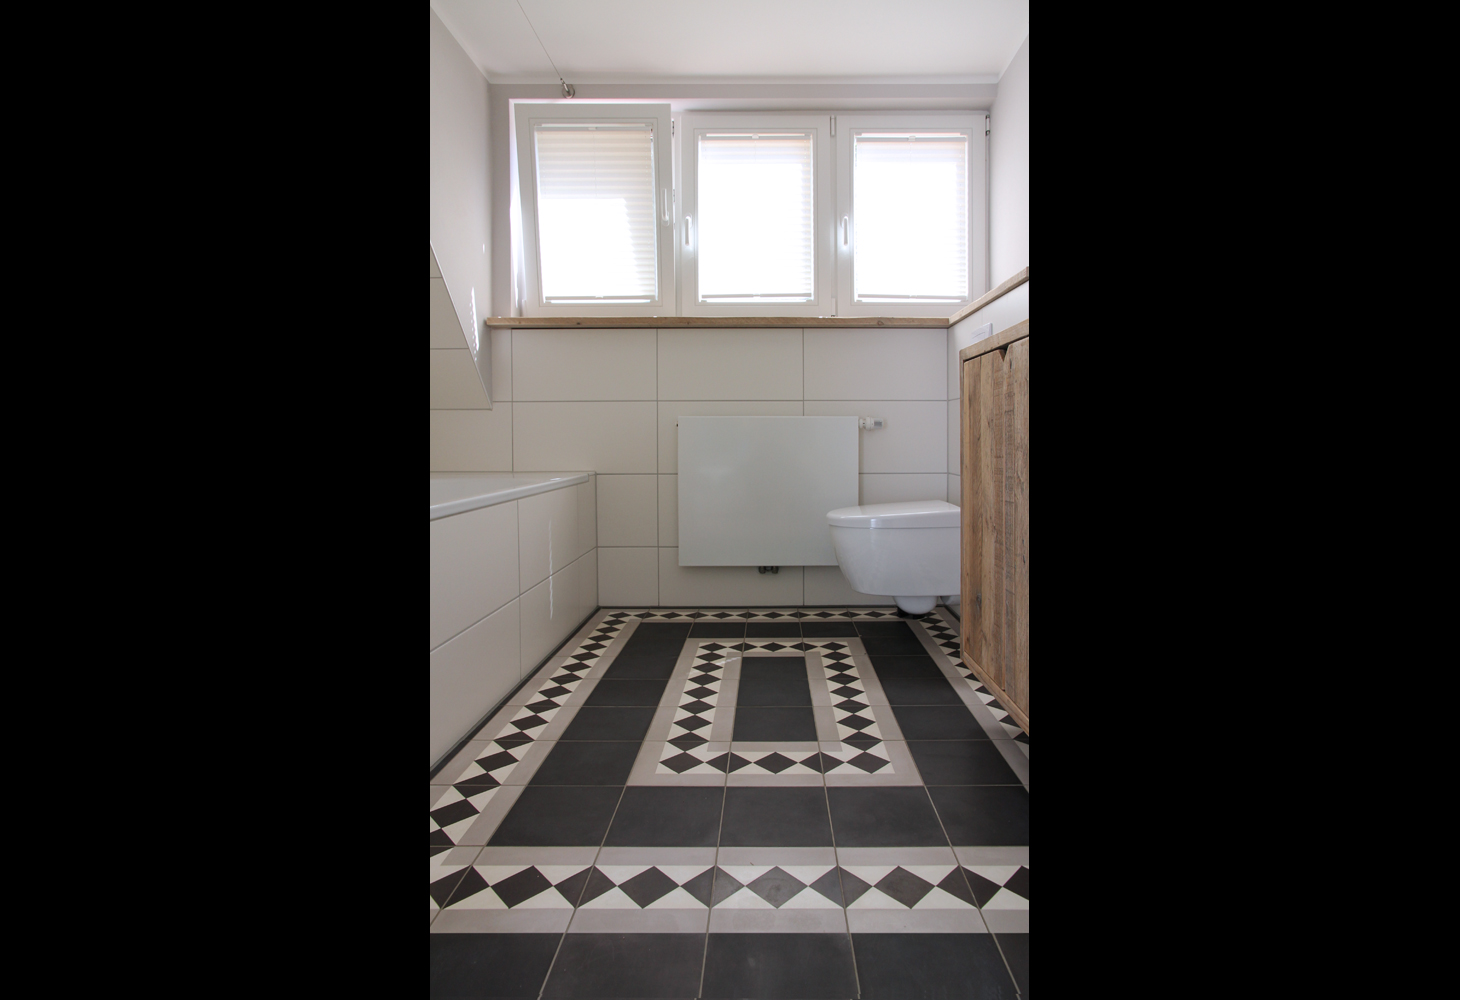 OG: Schönes Bodenmosaik aus Zementmosaikplatten der Firma VIA.